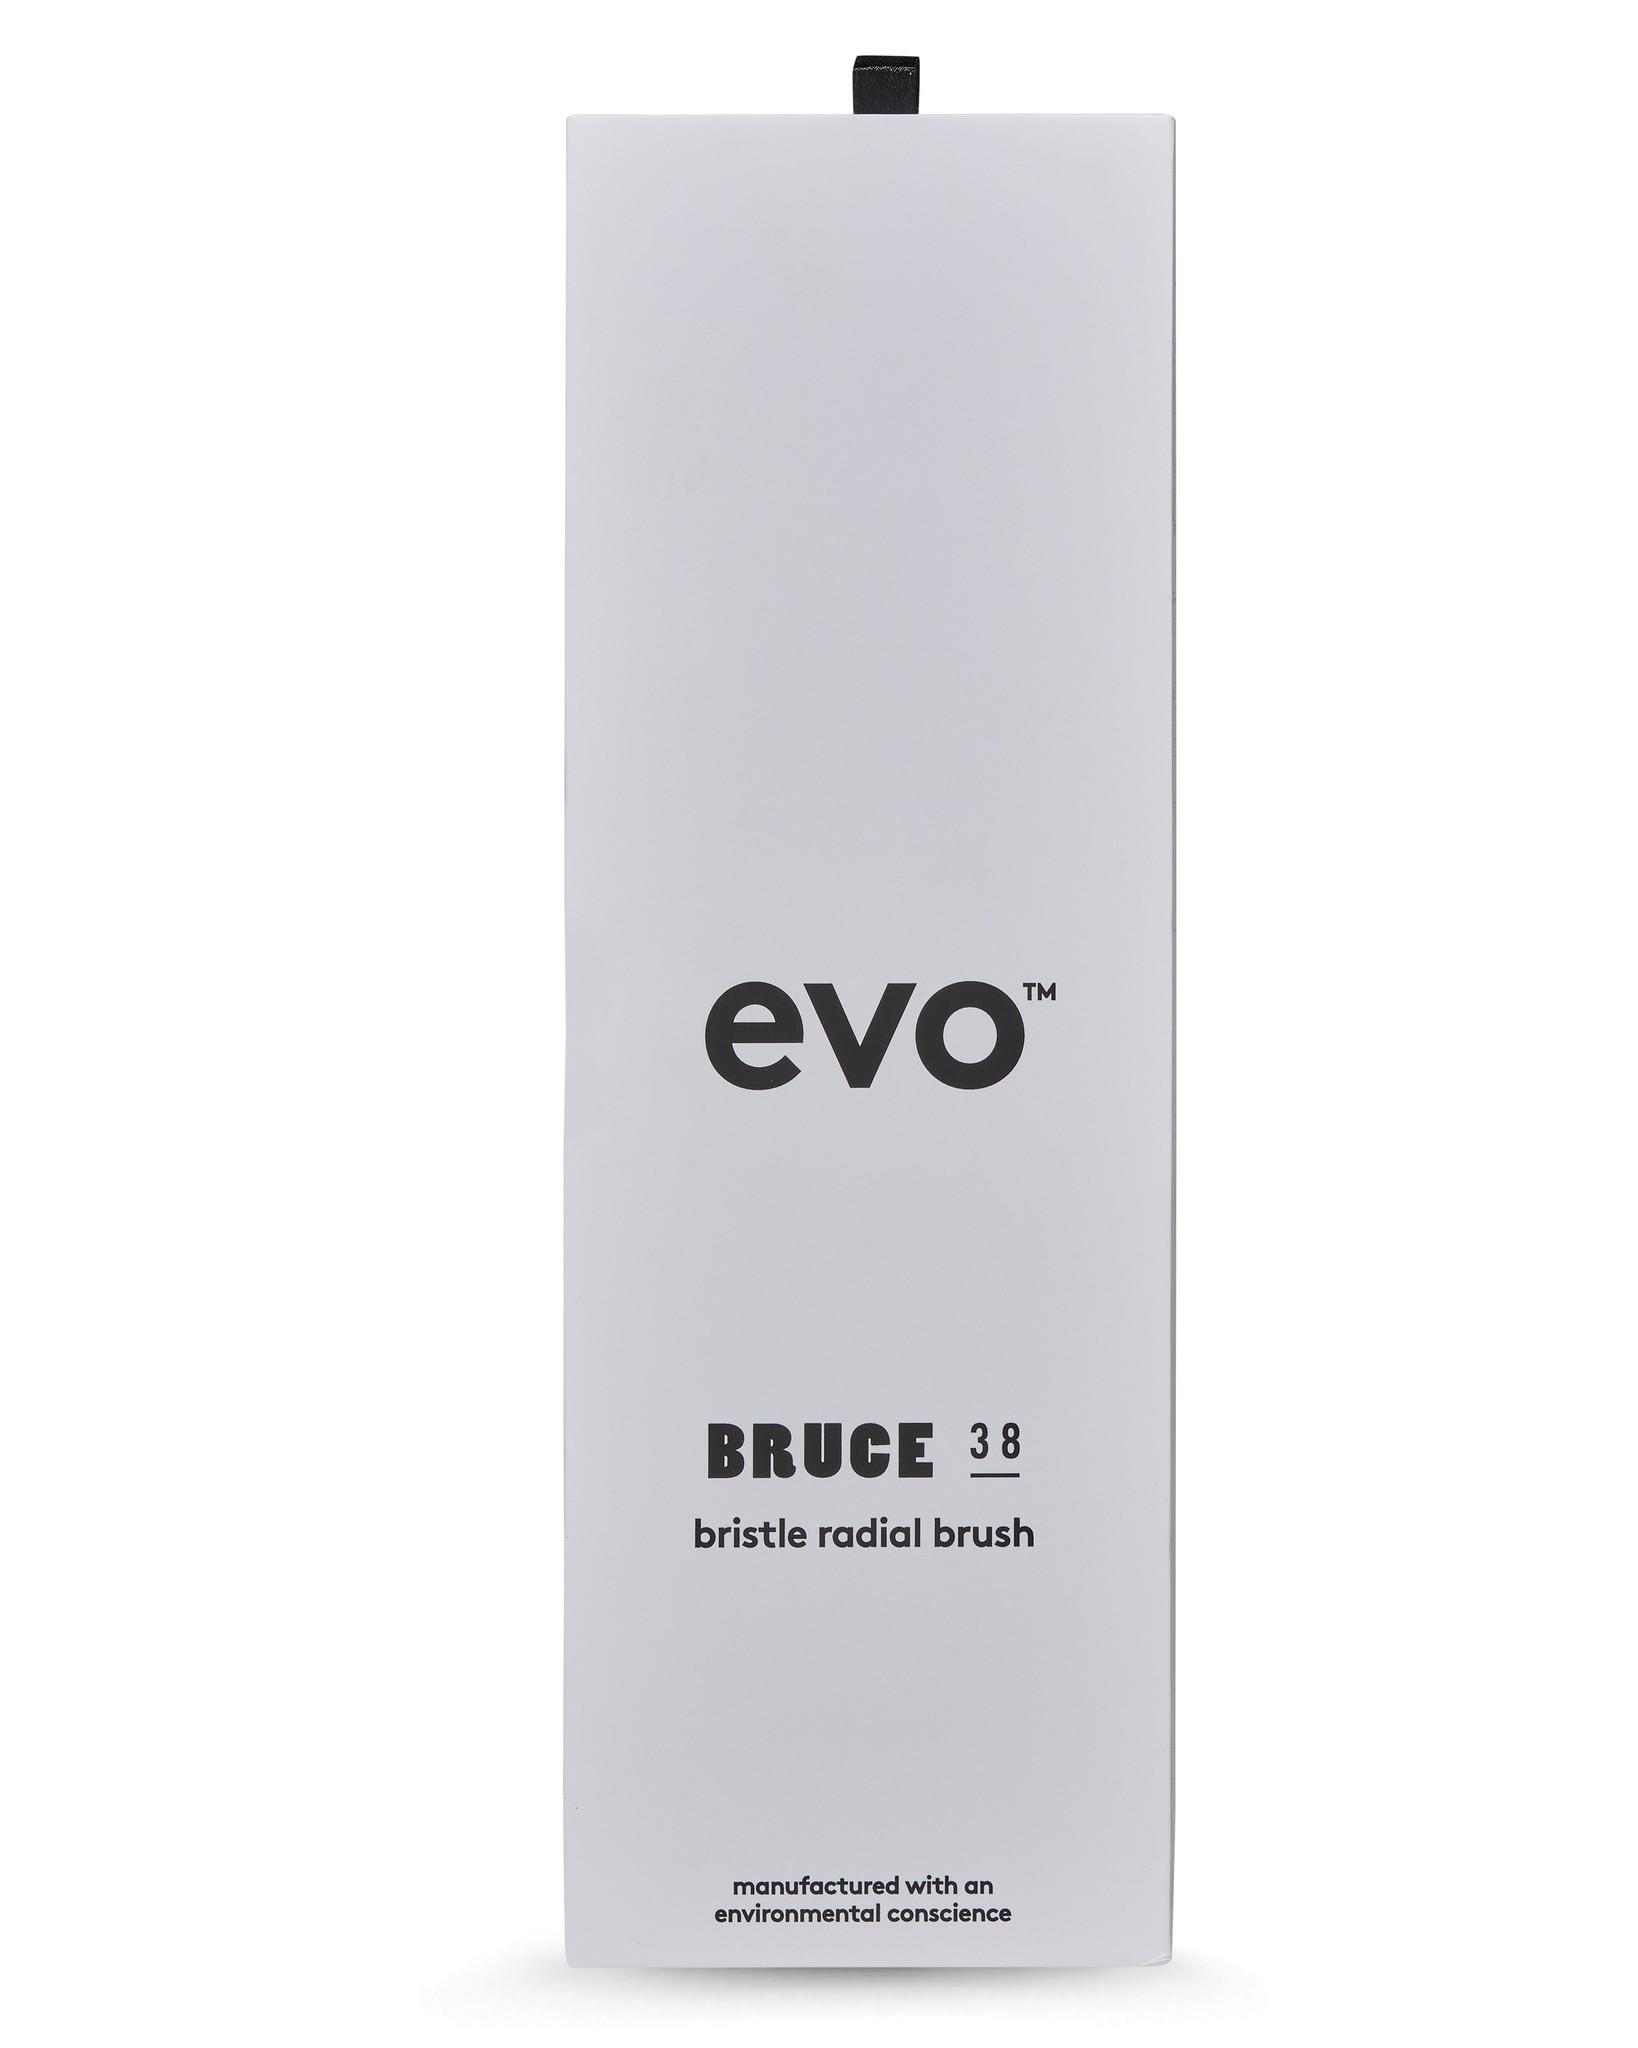 EVO Brosse BRUCE ronde à poils de sanglier naturels 38mm